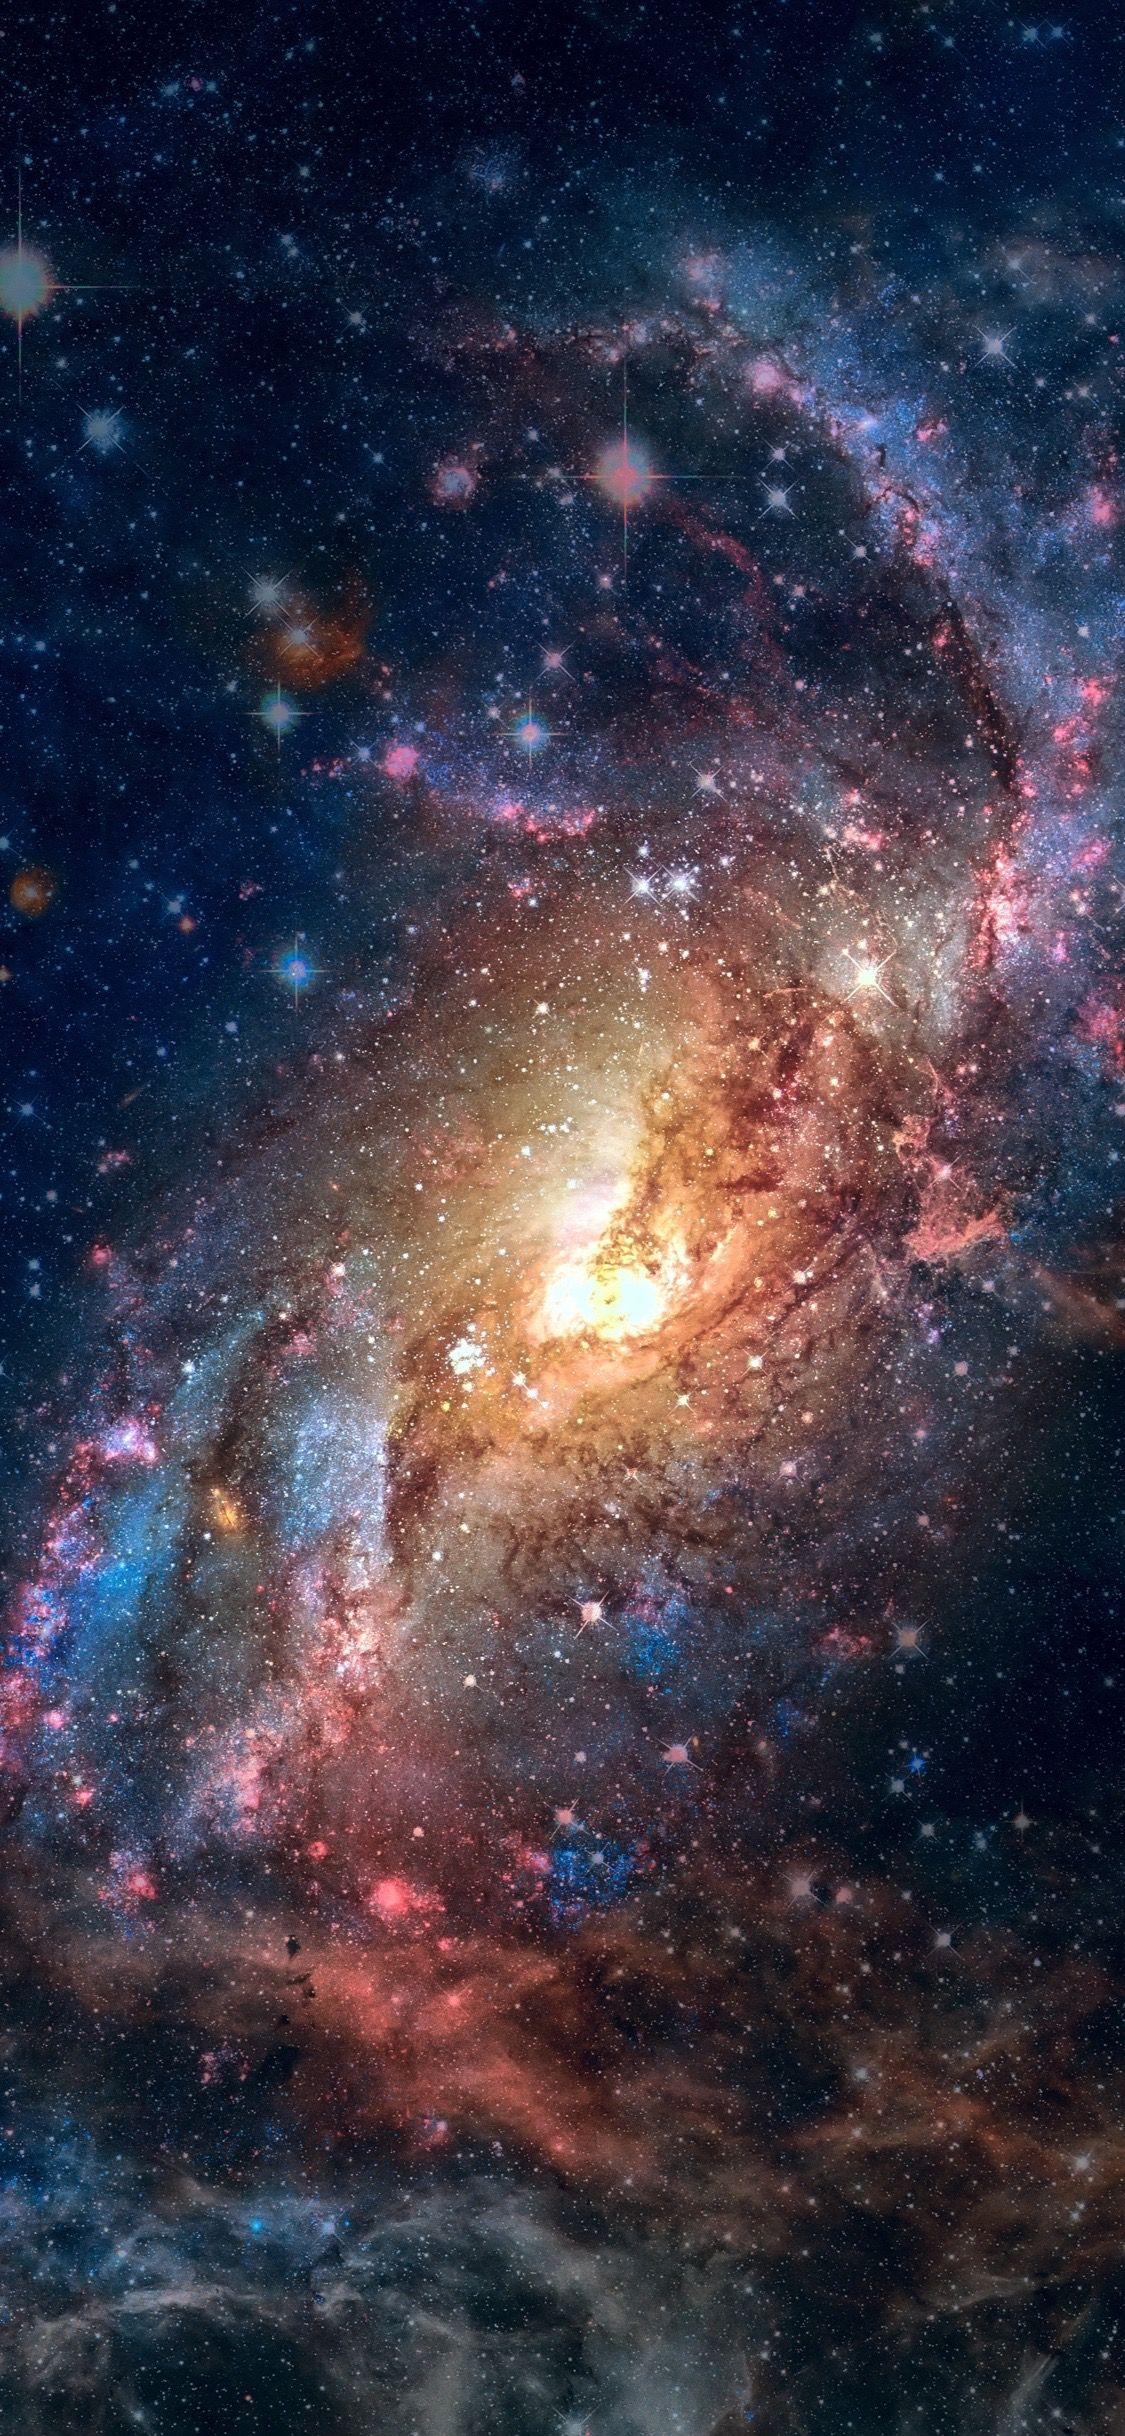 Pin By Yusuf Acar On Shxxting Stars Nebula Wallpaper Space Phone Wallpaper Galaxy Wallpaper Iphone